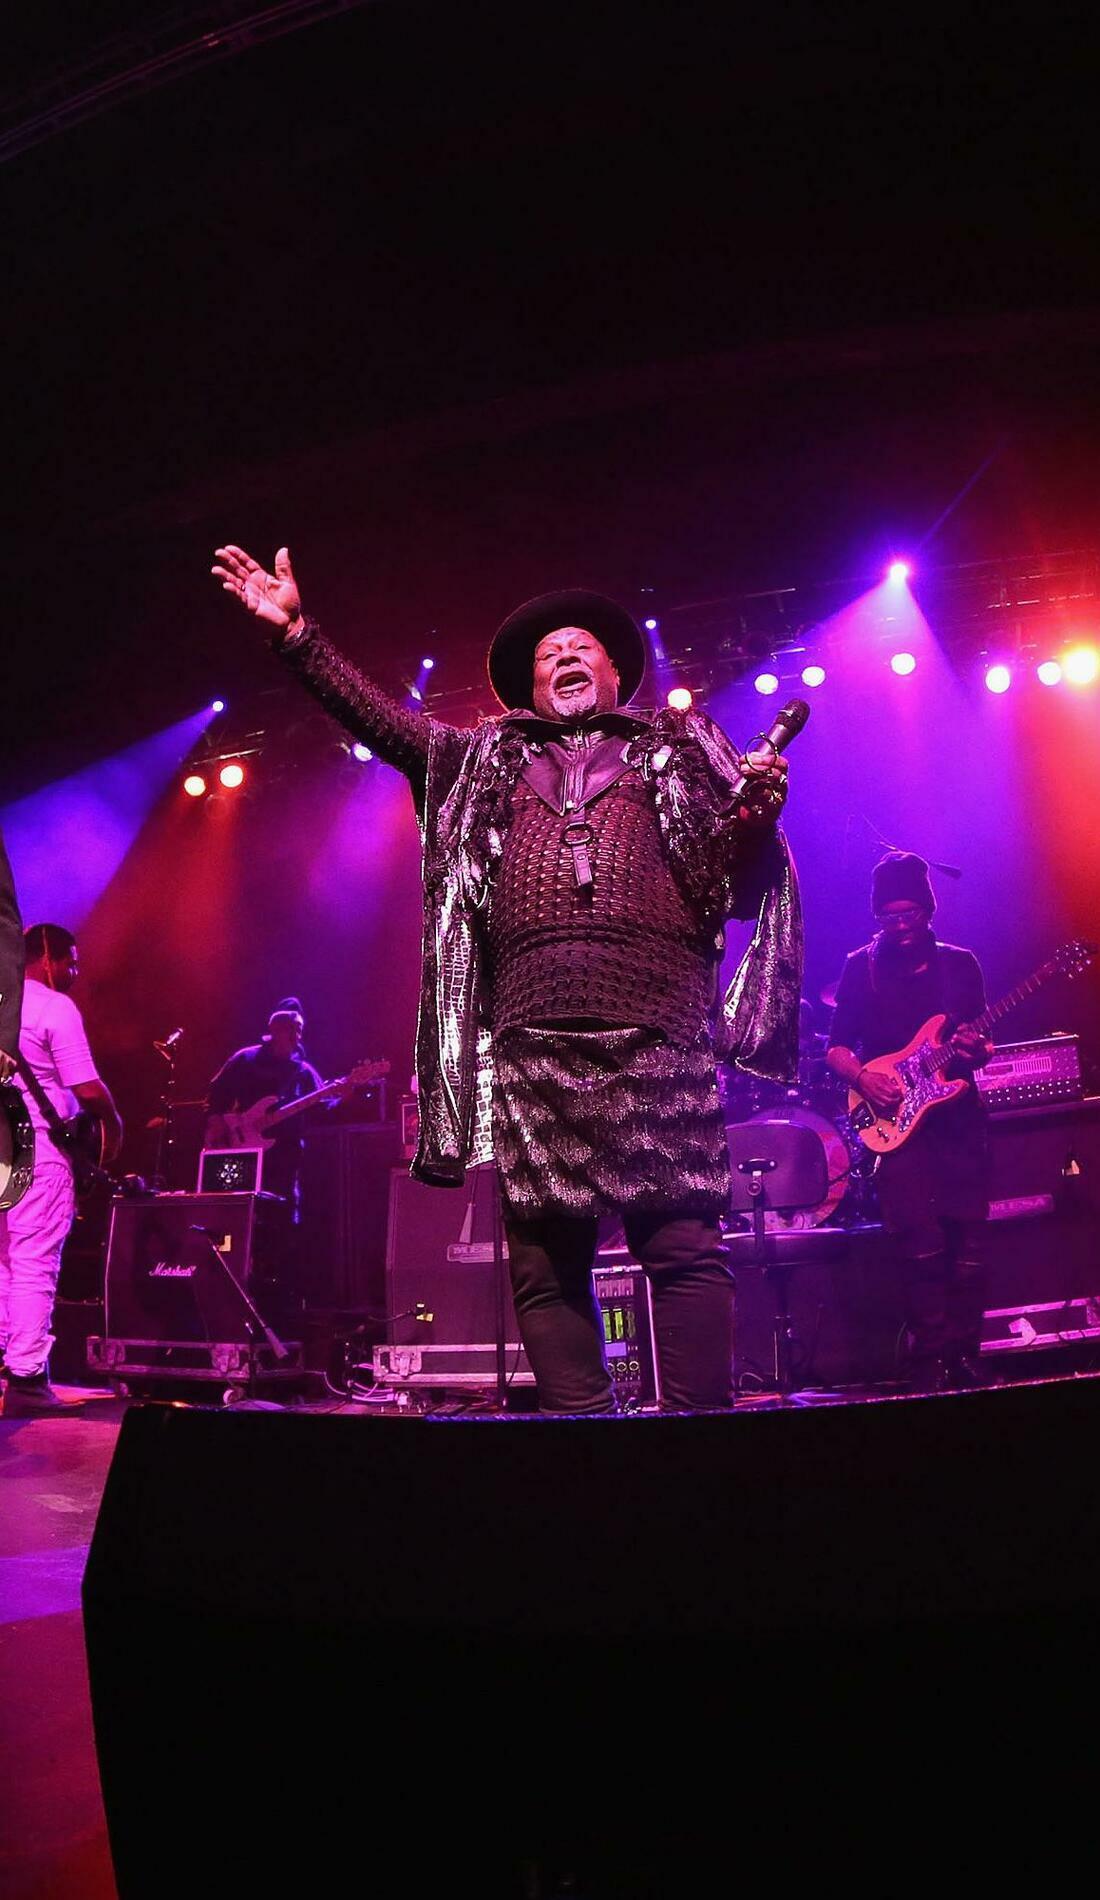 A Parliament Funkadelic live event